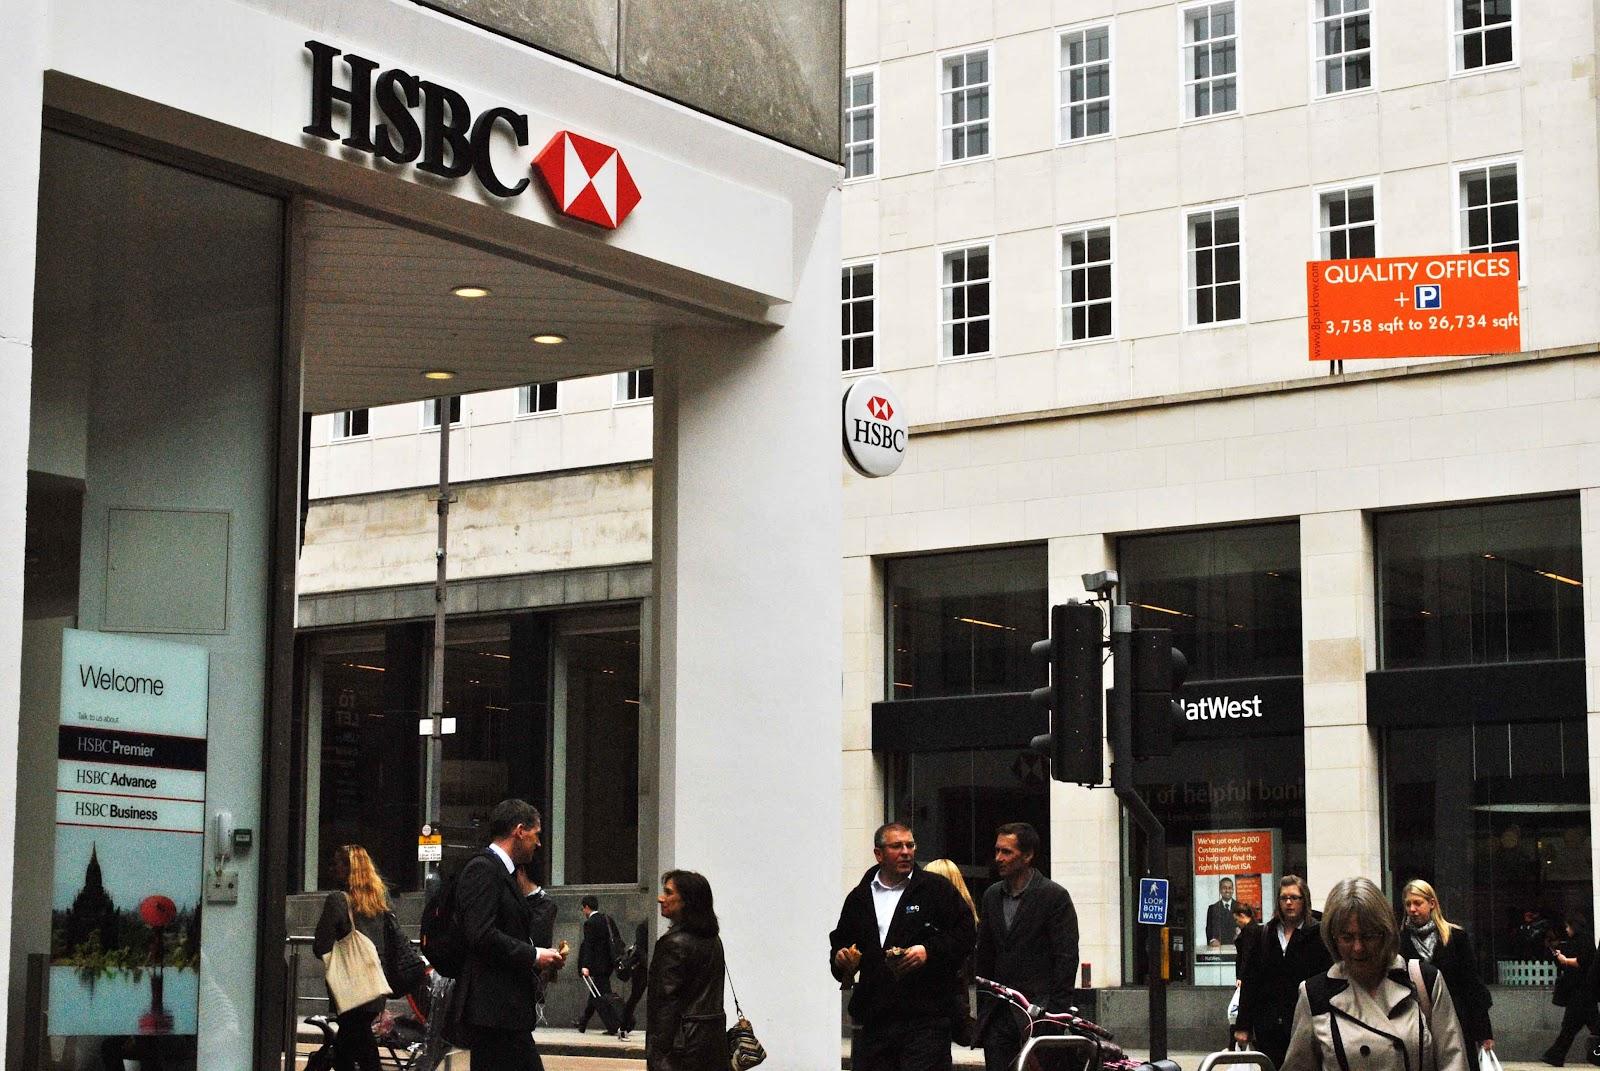 Hsbc Business Isa